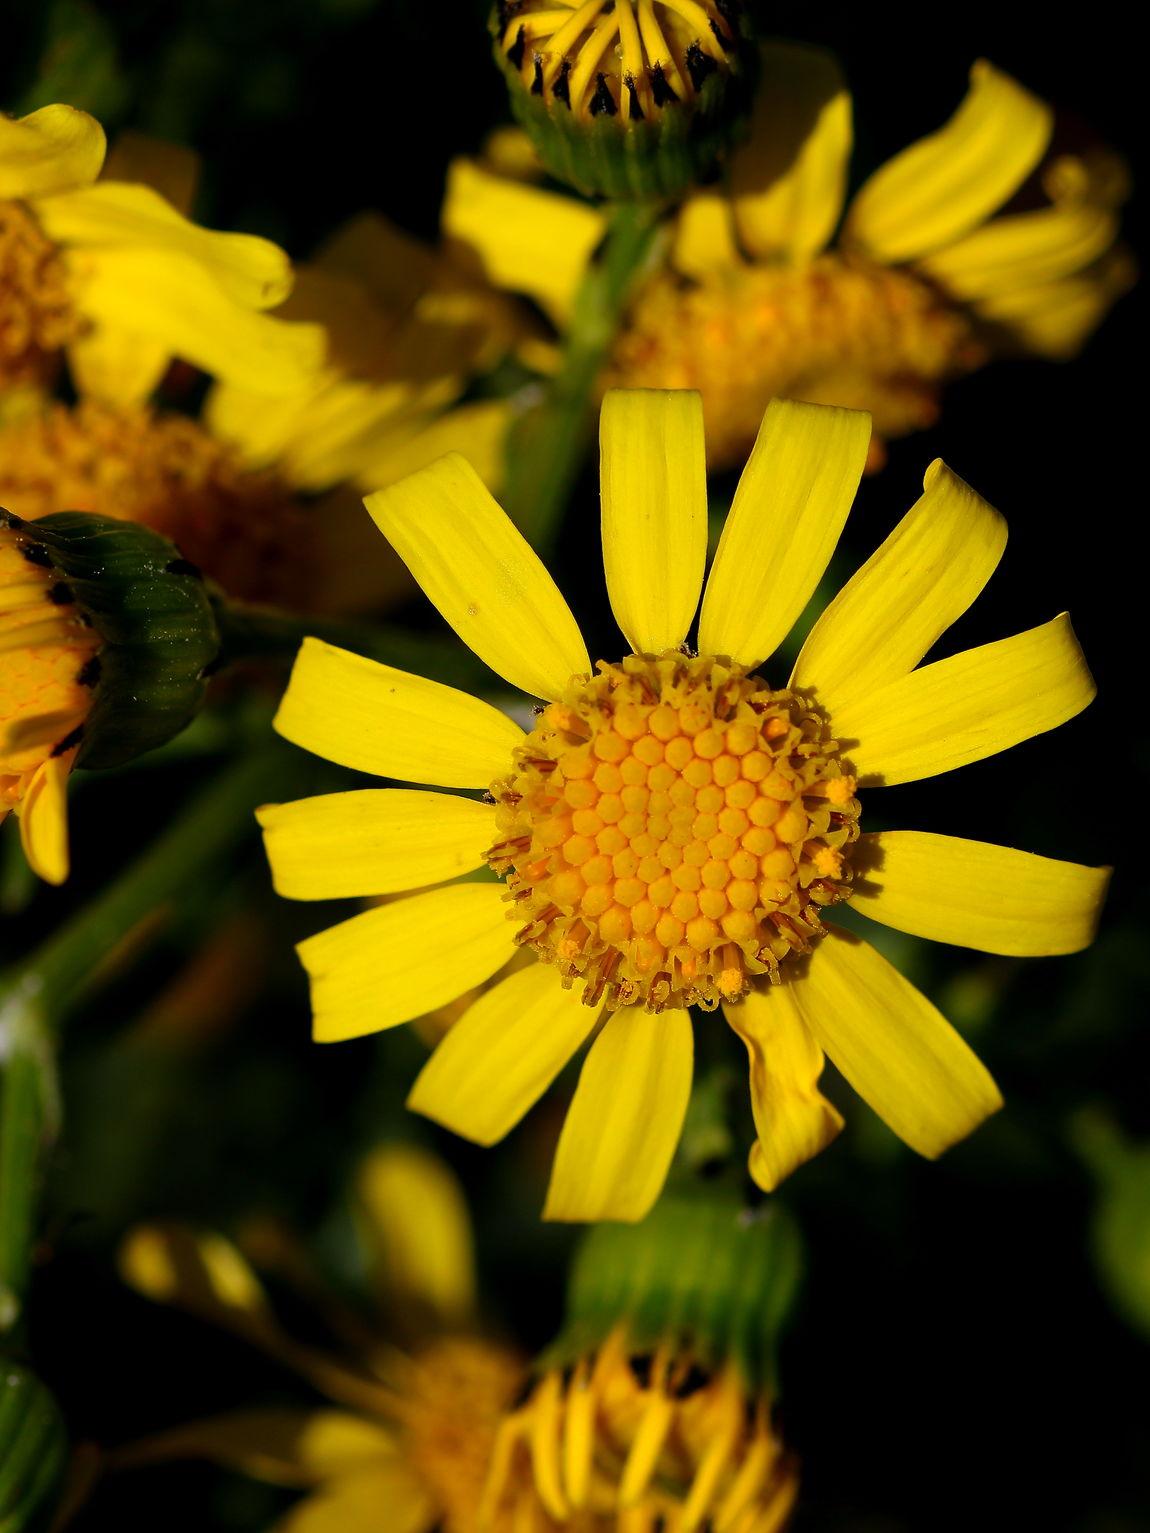 primavera Botany Flower Focus On Foreground Fragility Freshness Macro Petal Pollen Selective Focus Yellow 452